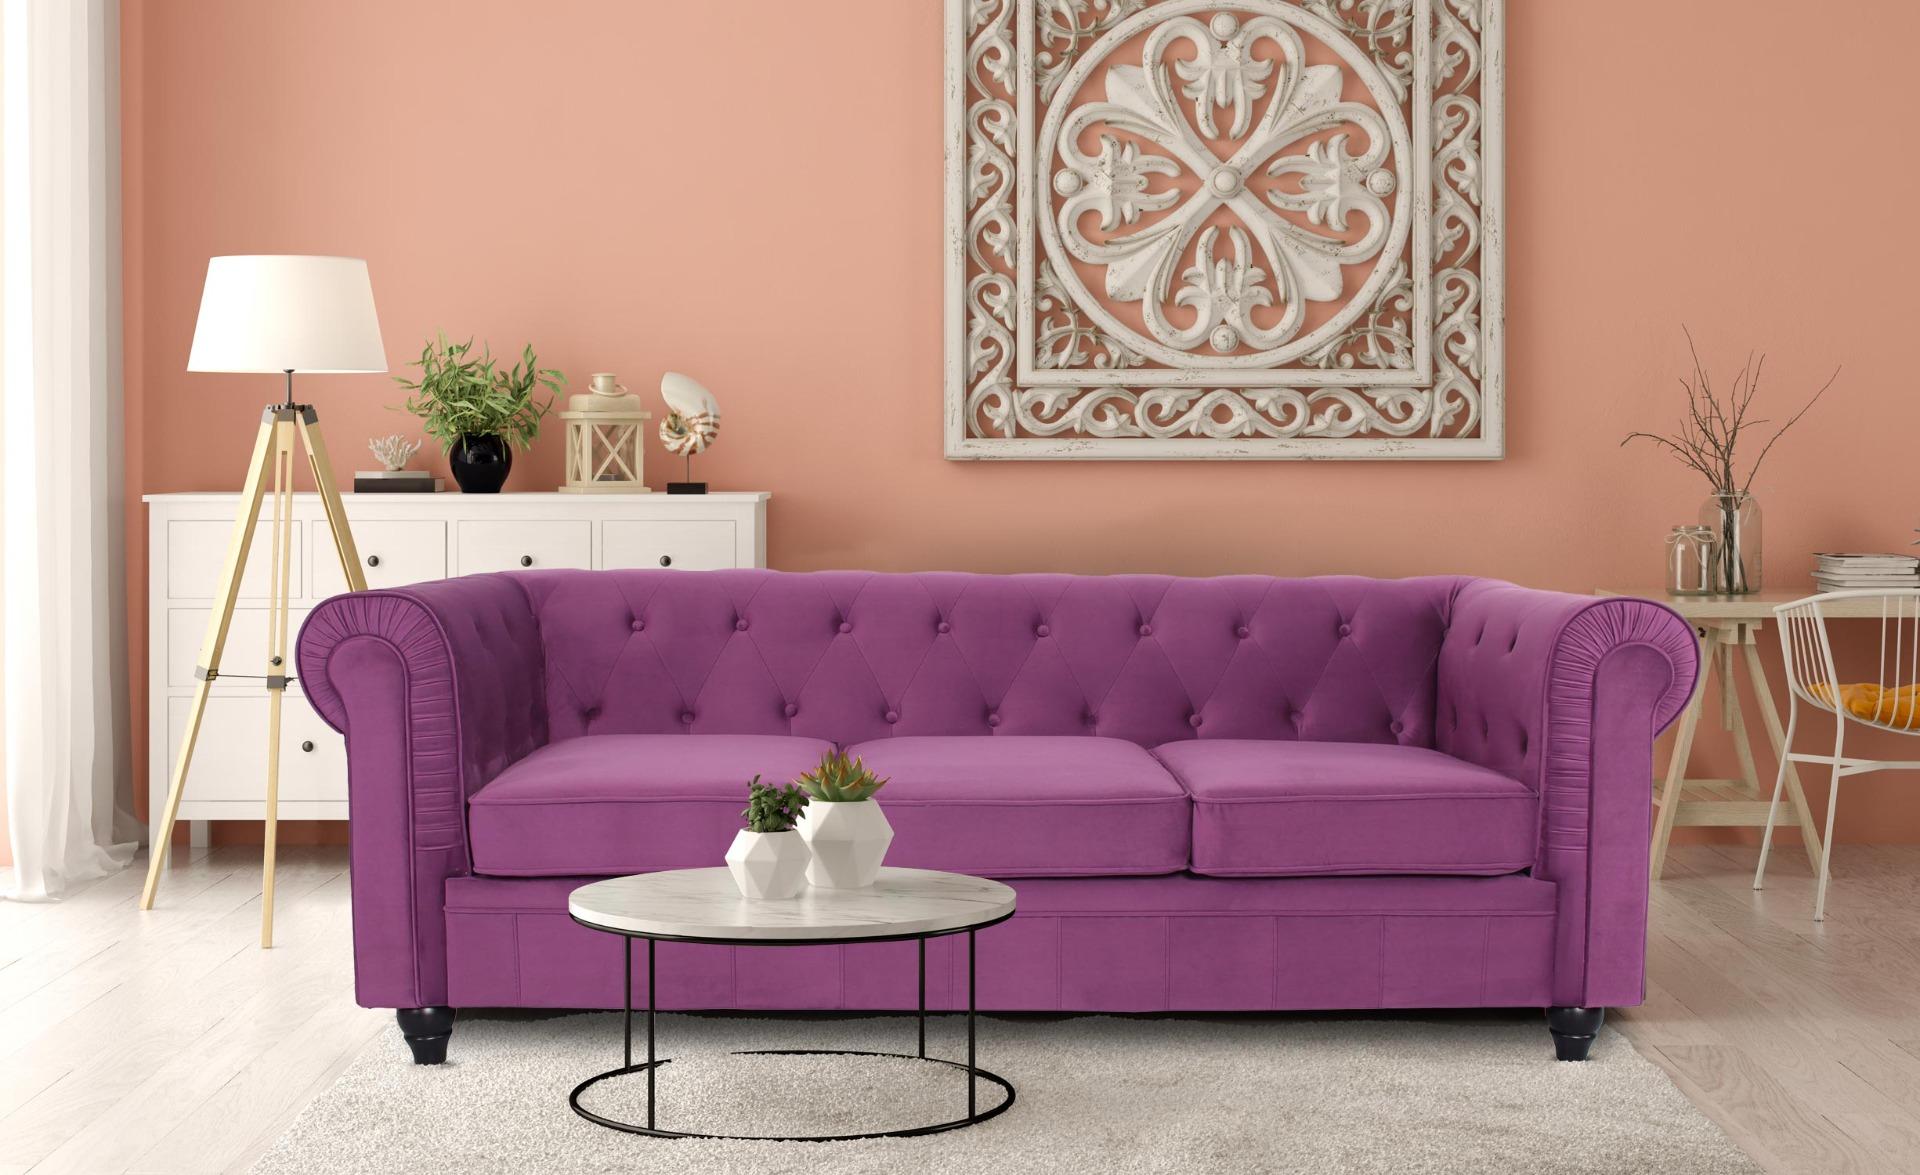 Grand Canapé Chesterfield 3-Sitzer Sofa mit Samtbezug Lila